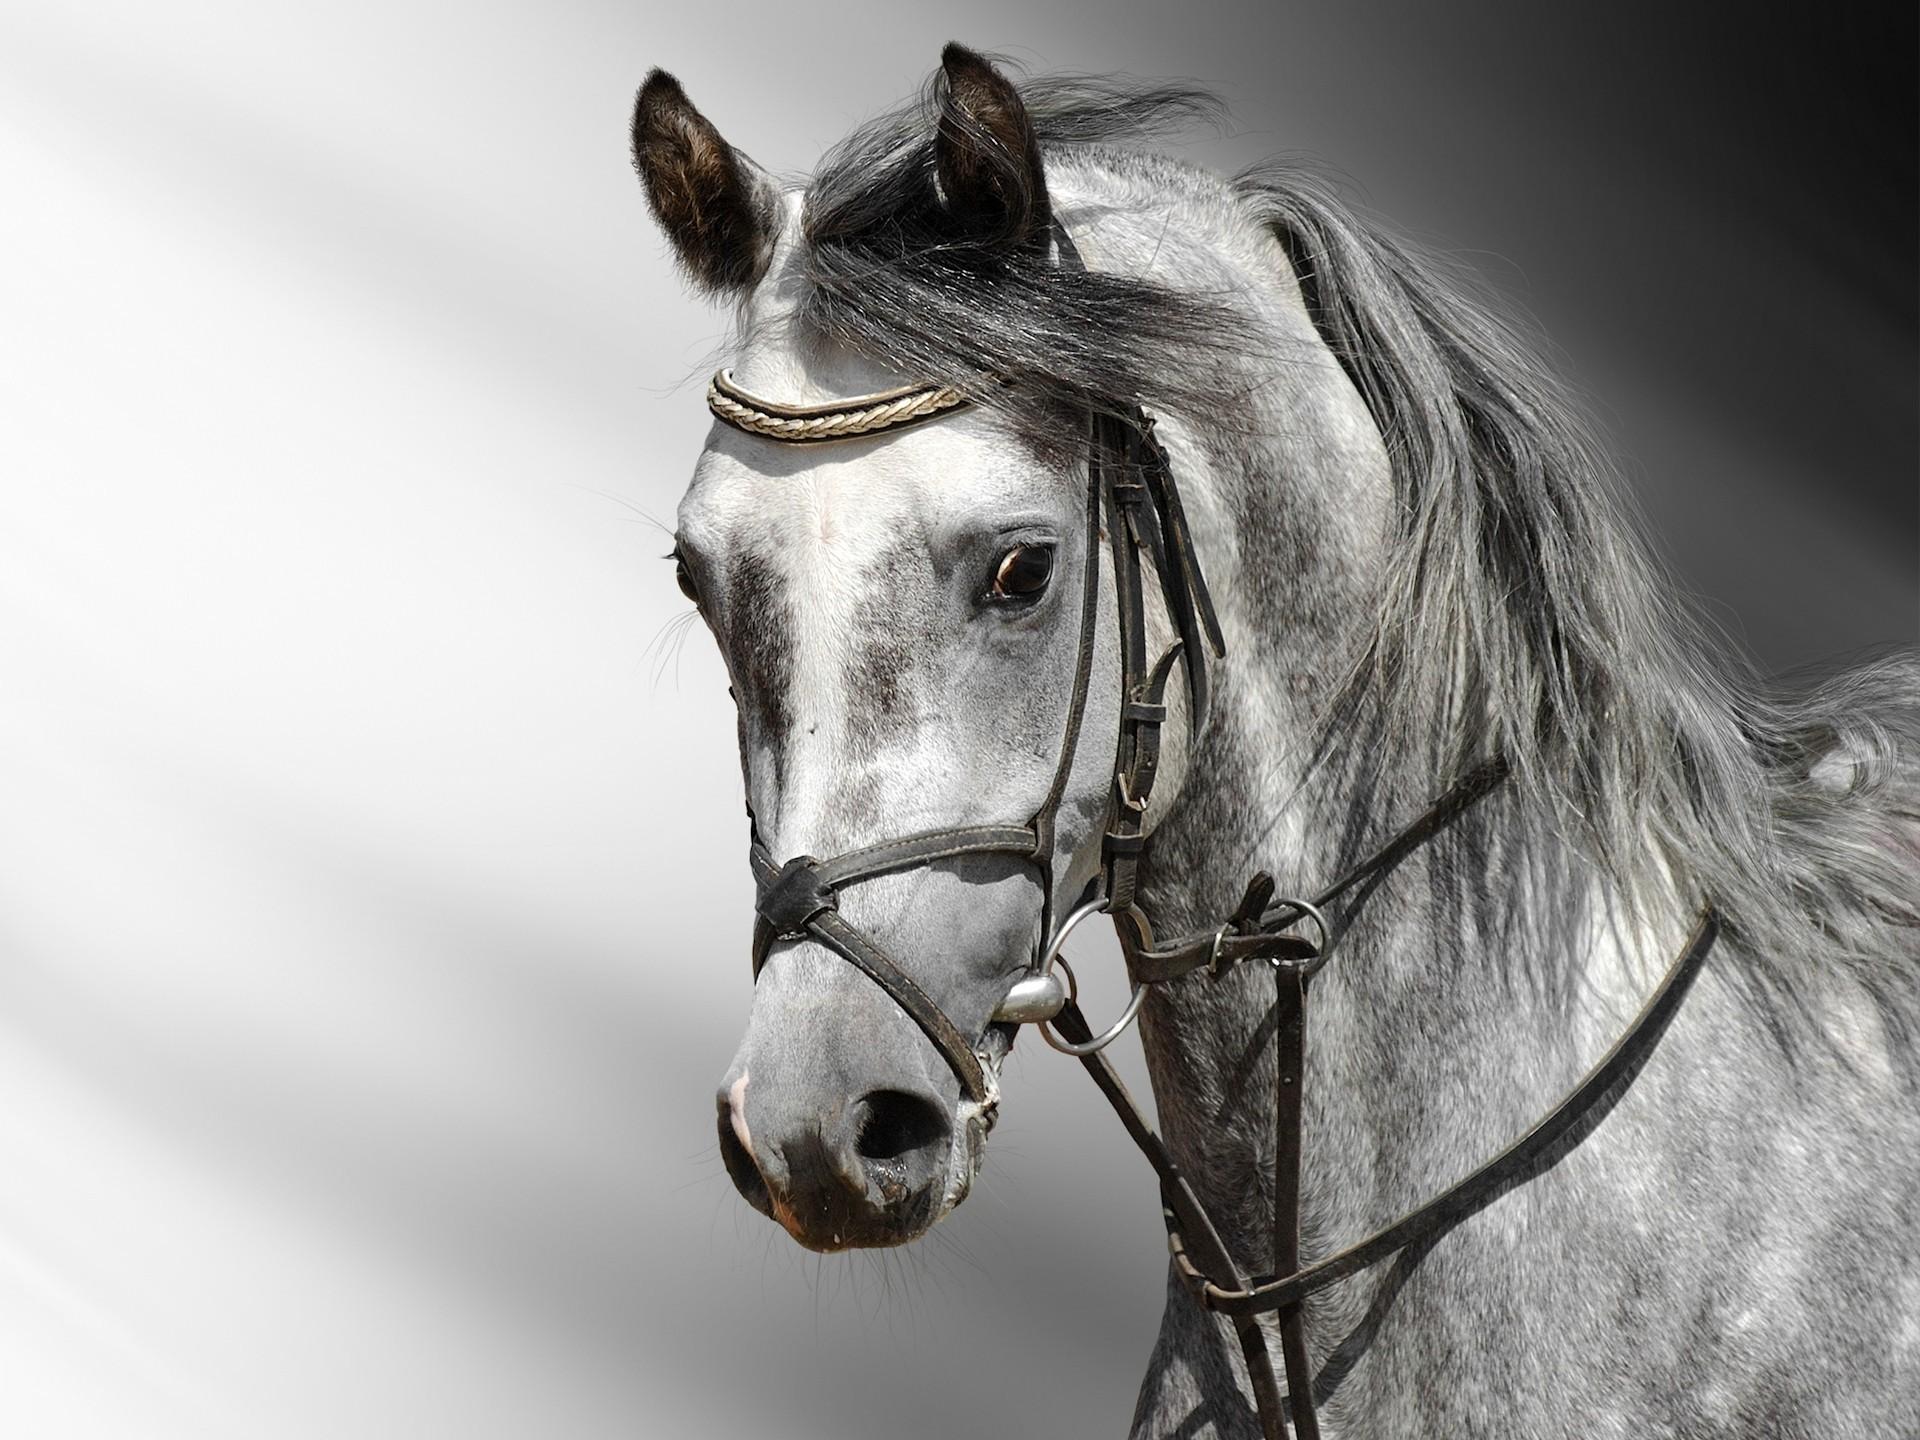 Beautiful Wallpaper High Resolution Horse - horse-wallpaper-hd-41338-42330-hd-wallpapers  Image_266843.jpg